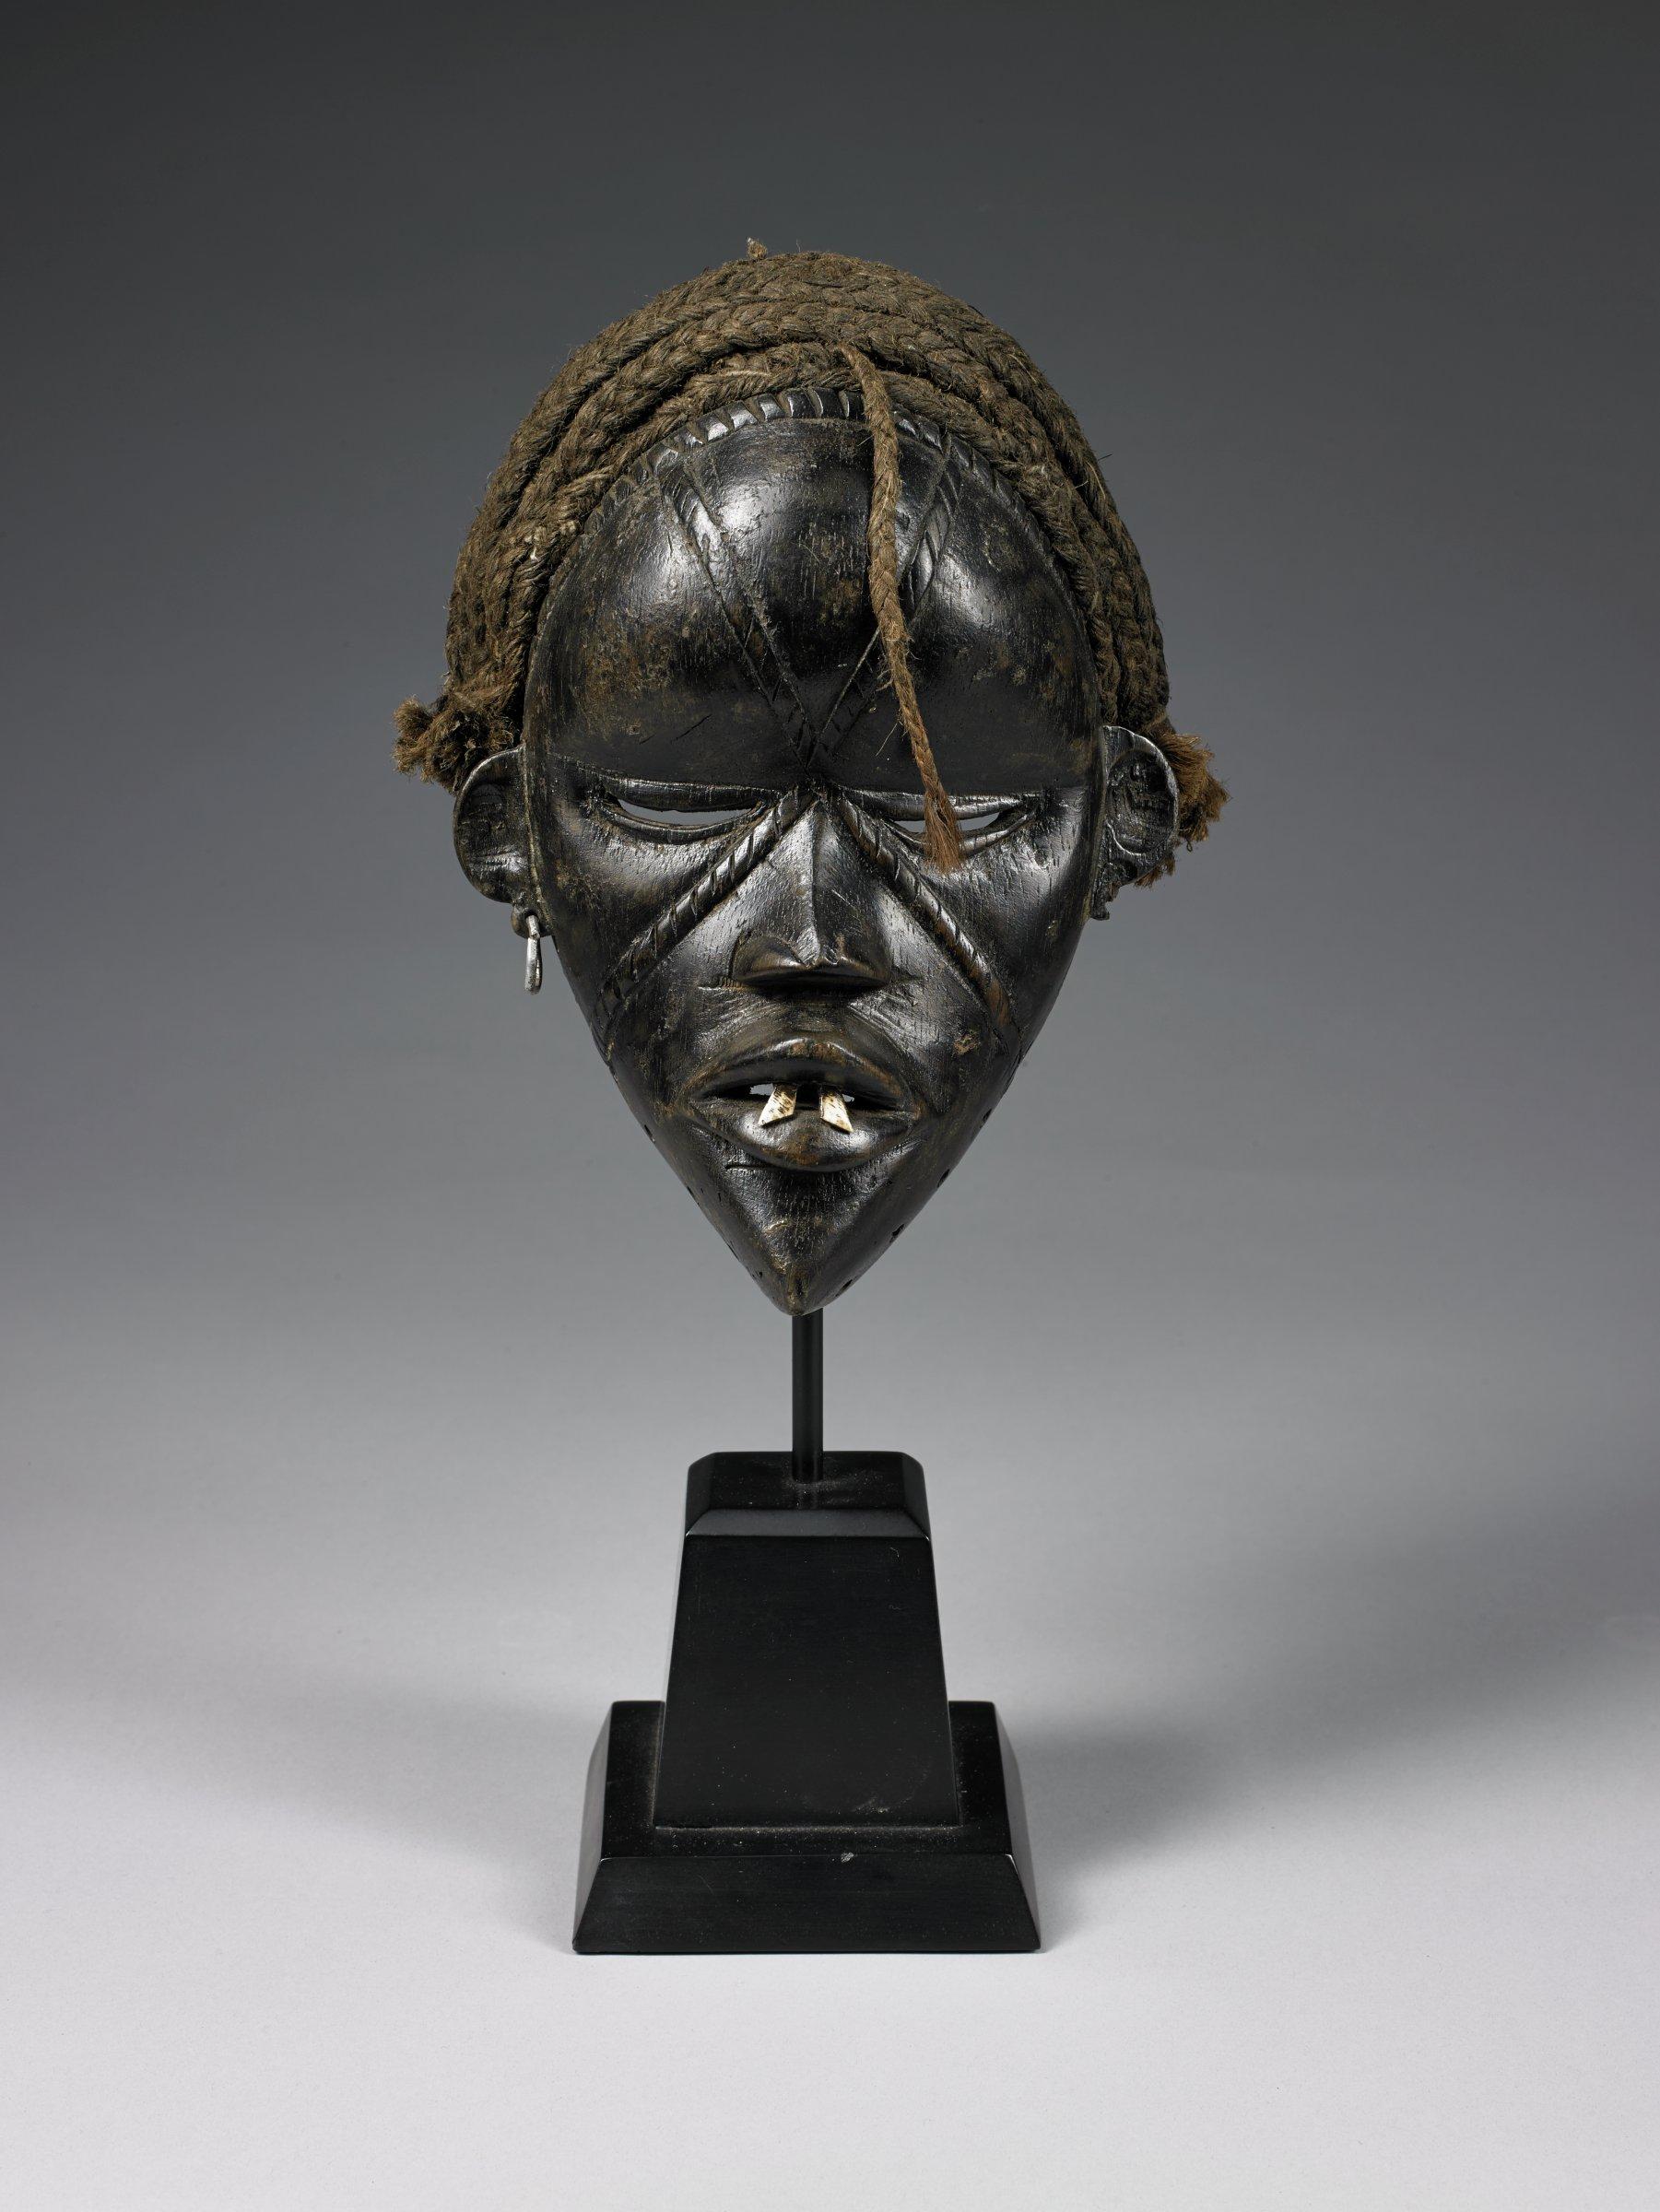 Mask (deangle), Dan people, Côte d'Ivoire, Liberia, African, wood, fiber, teeth